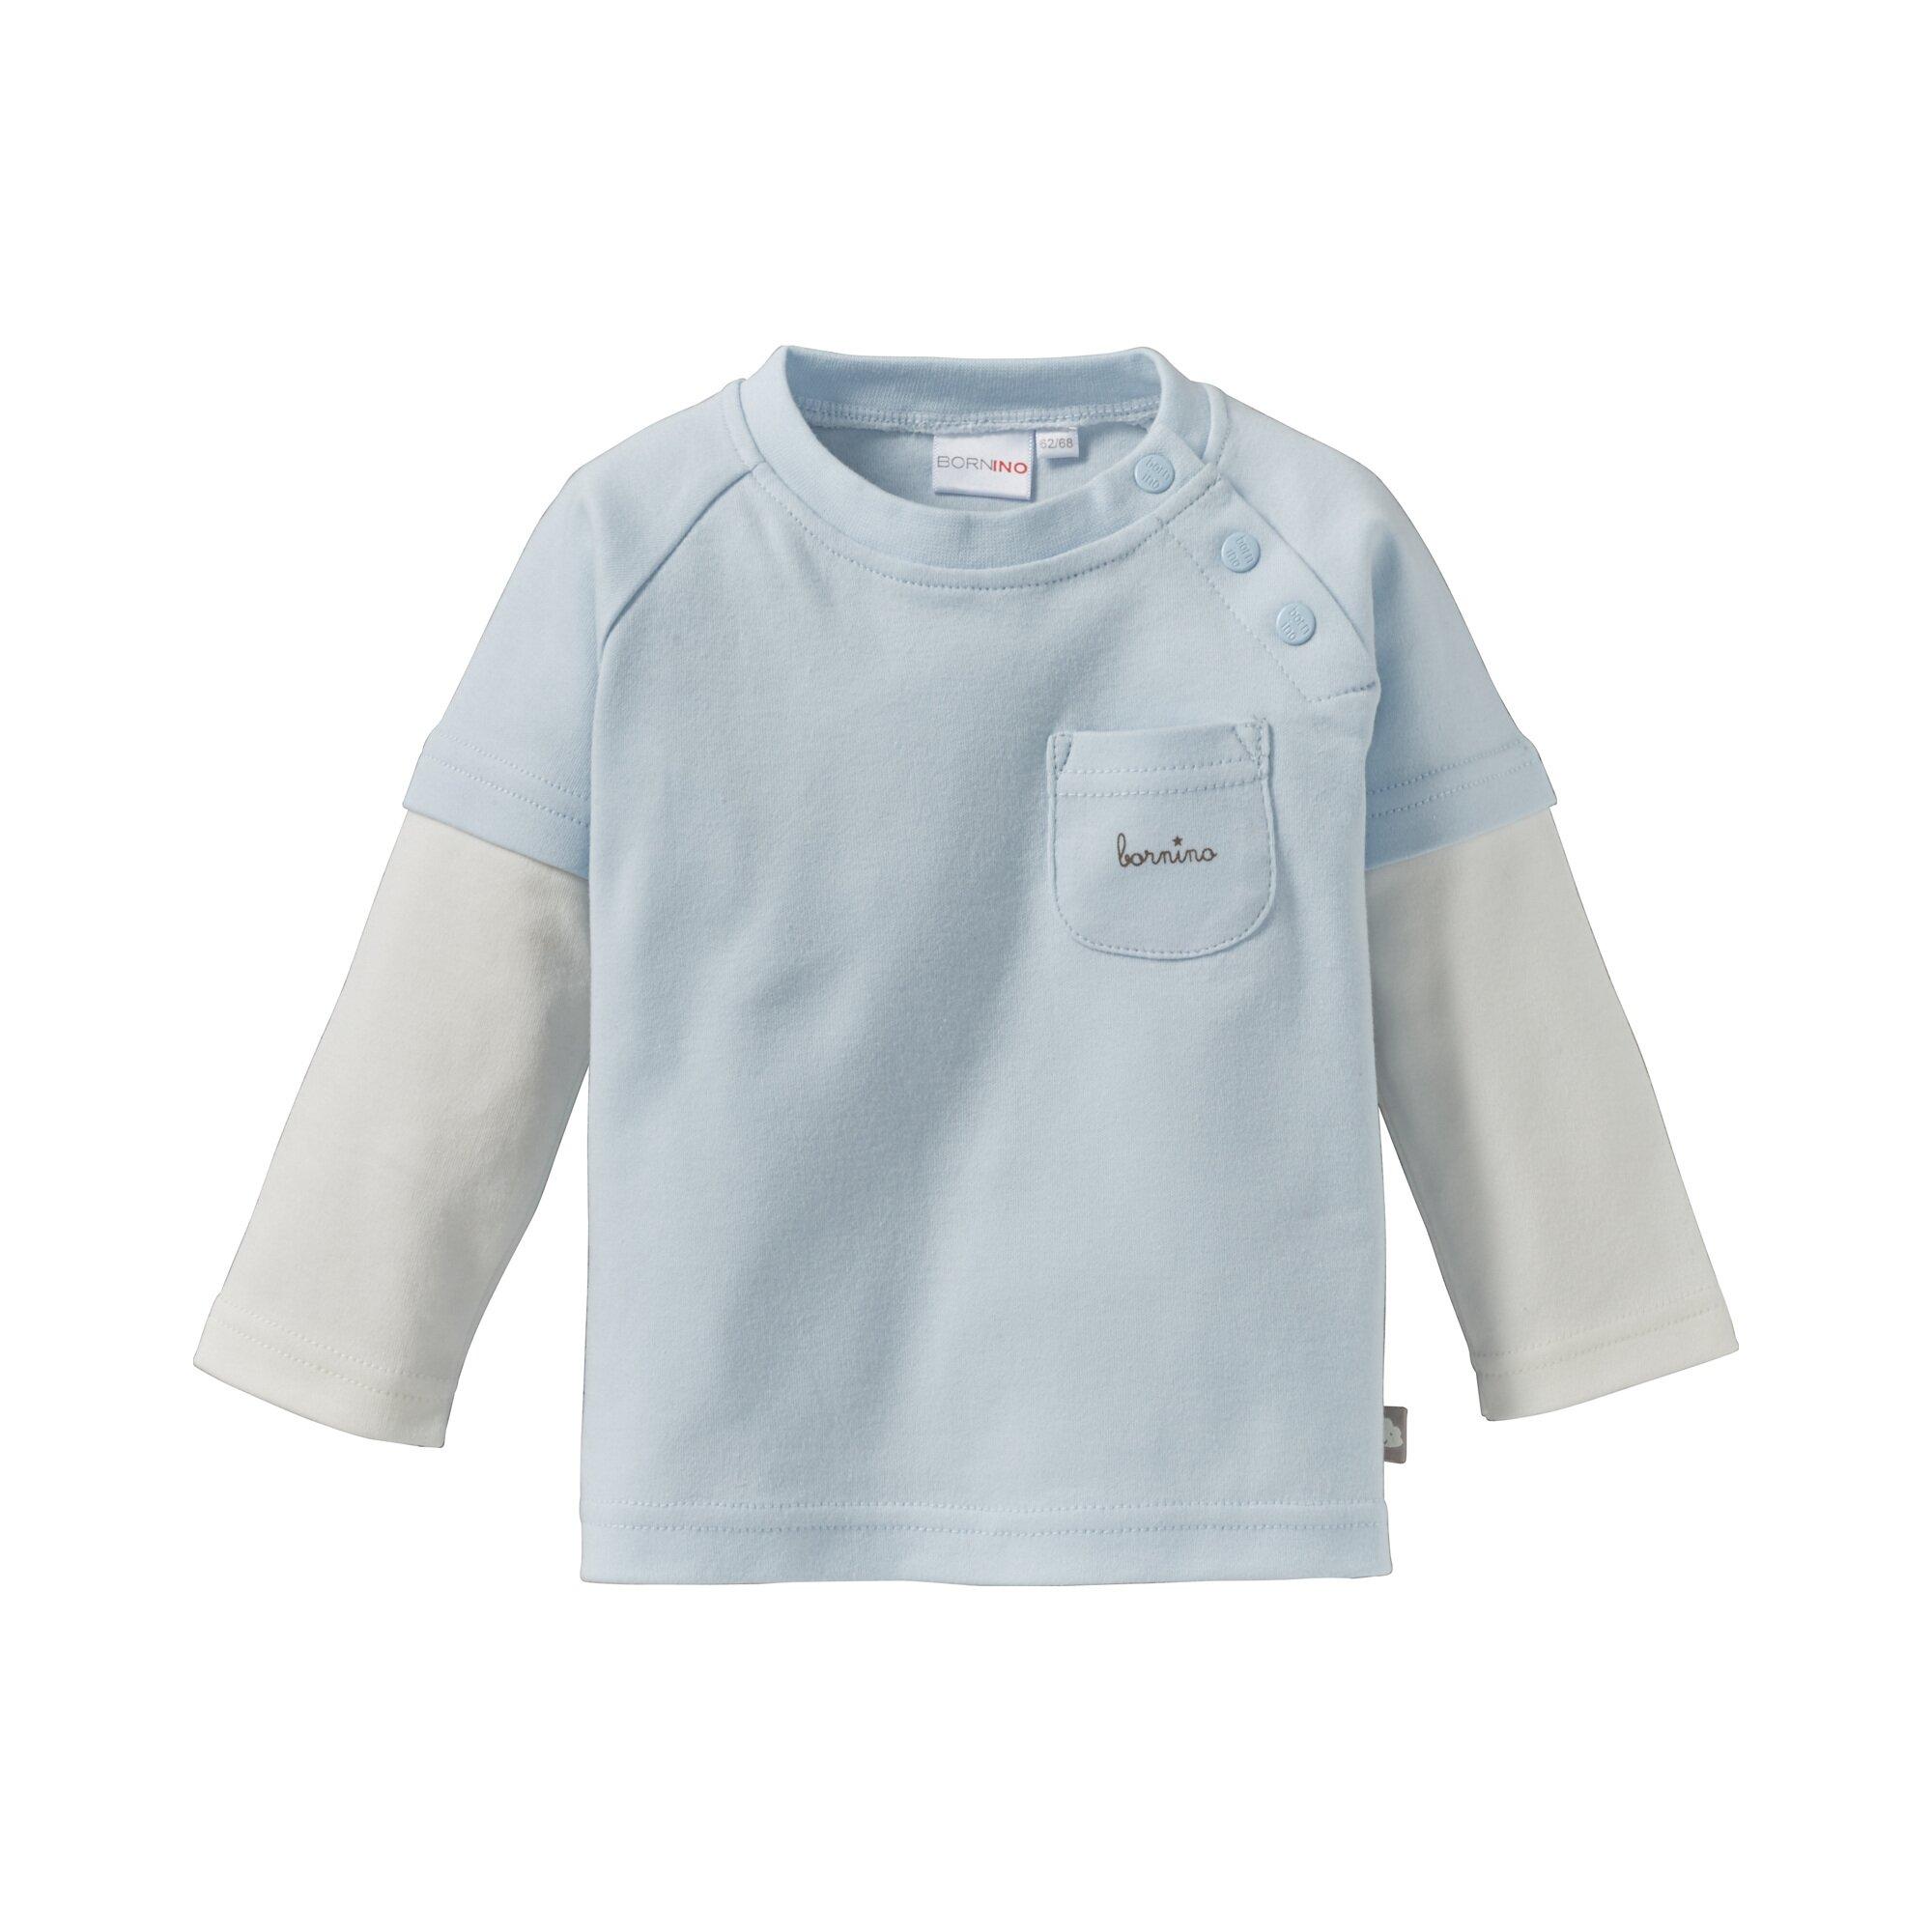 basics-schlafanzug-lang